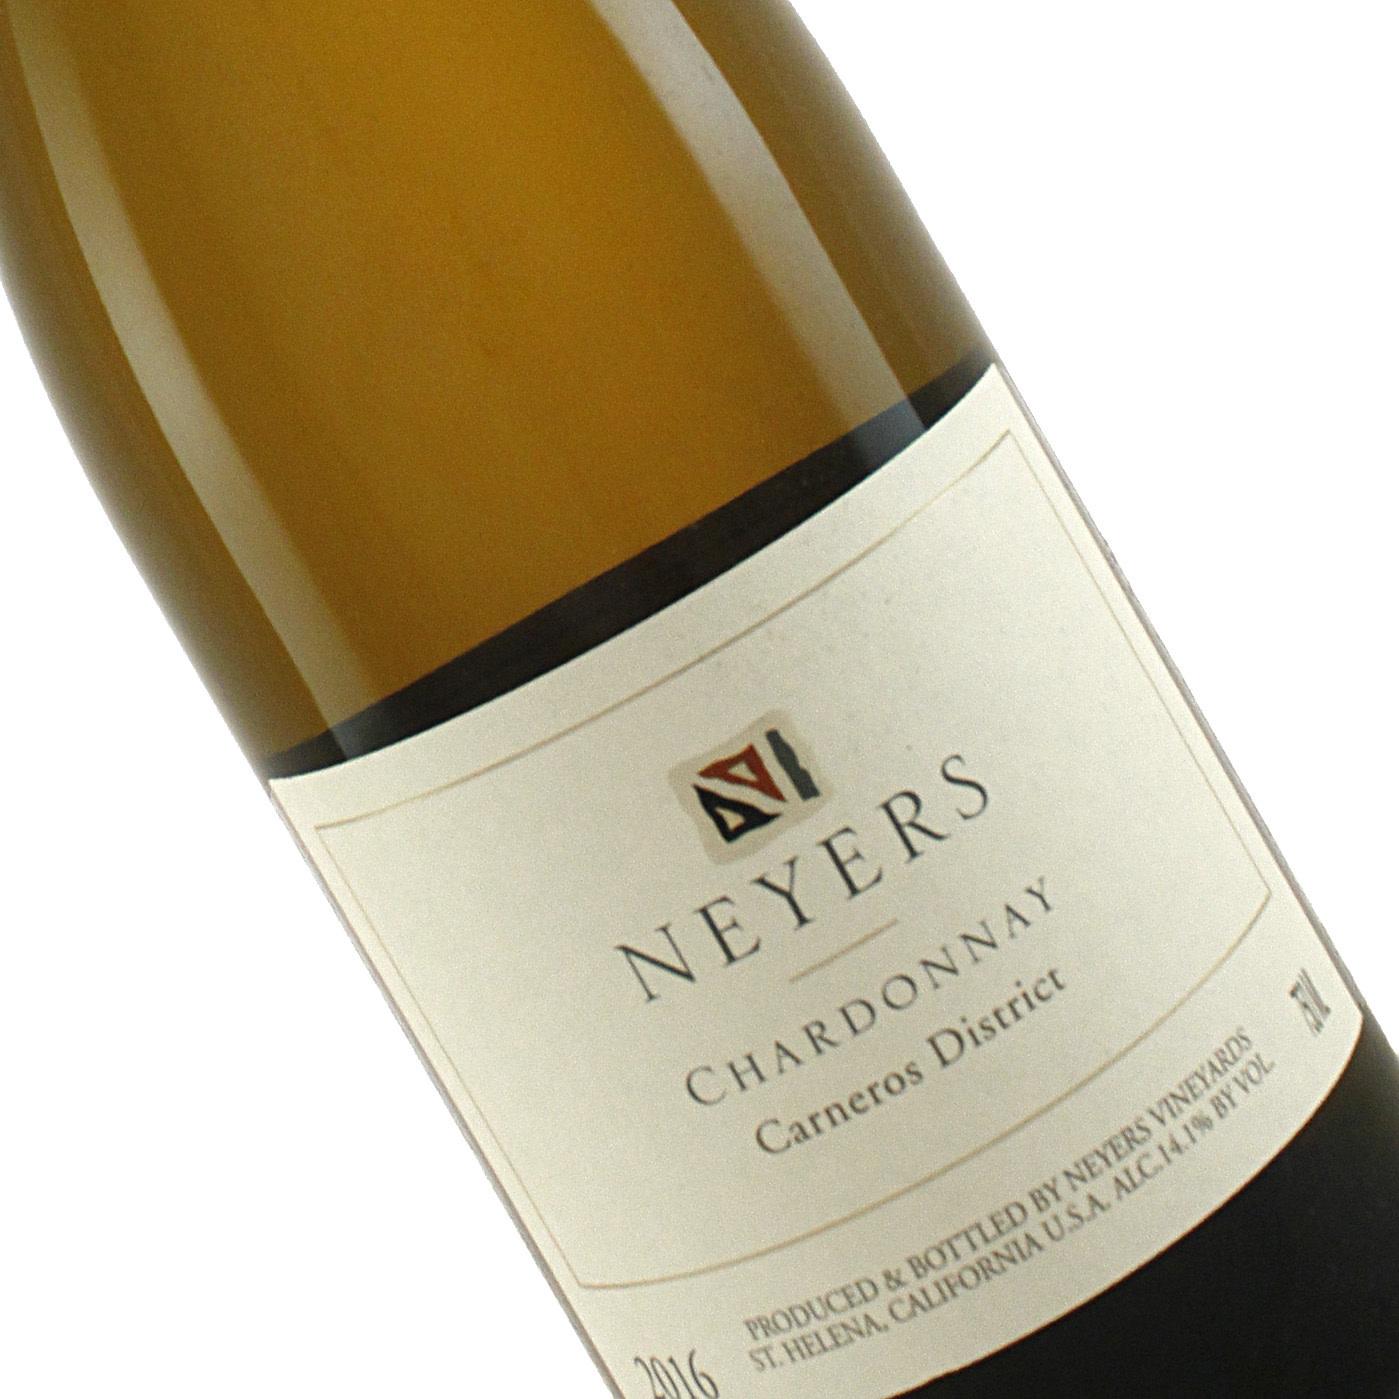 Neyers 2018 Chardonnay, Carneros